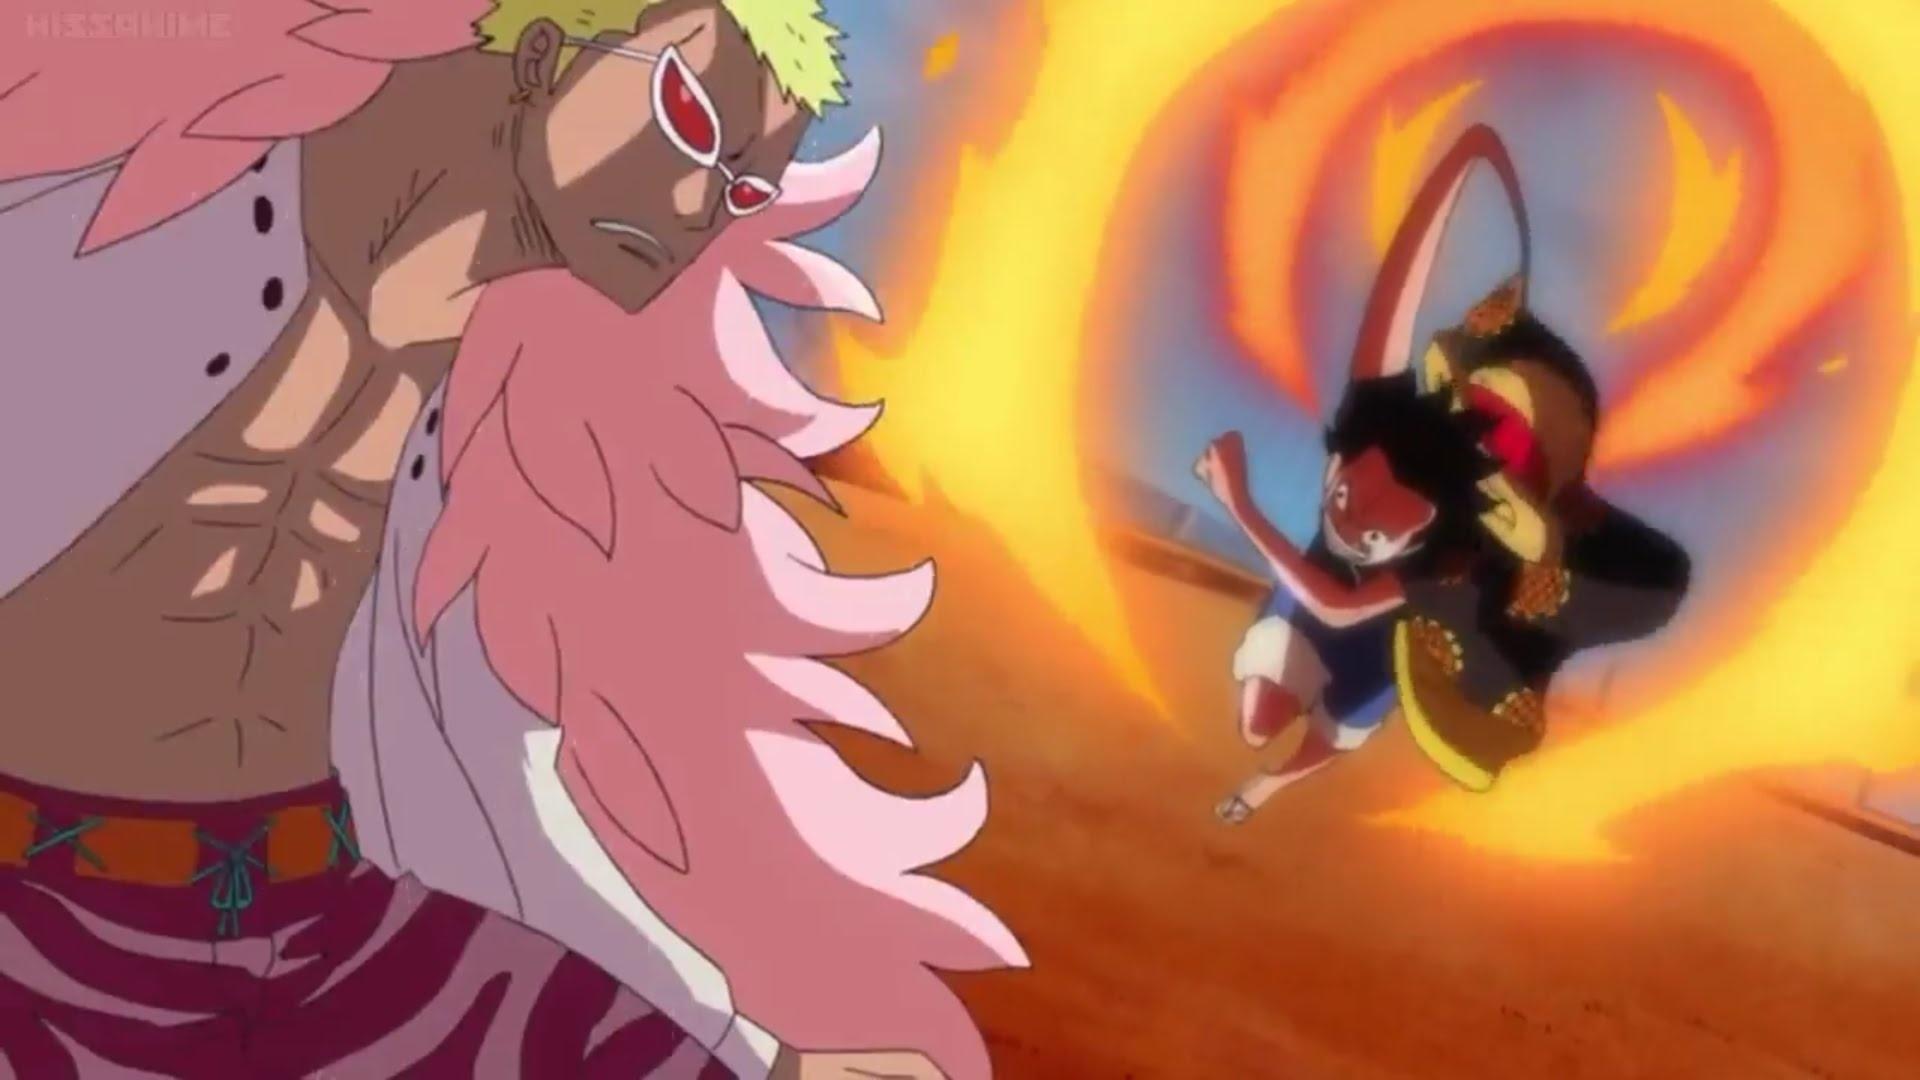 Naruto's raw speed far surpasses that of ftg, instant teleportation. X Qbyfj4bjzz1m